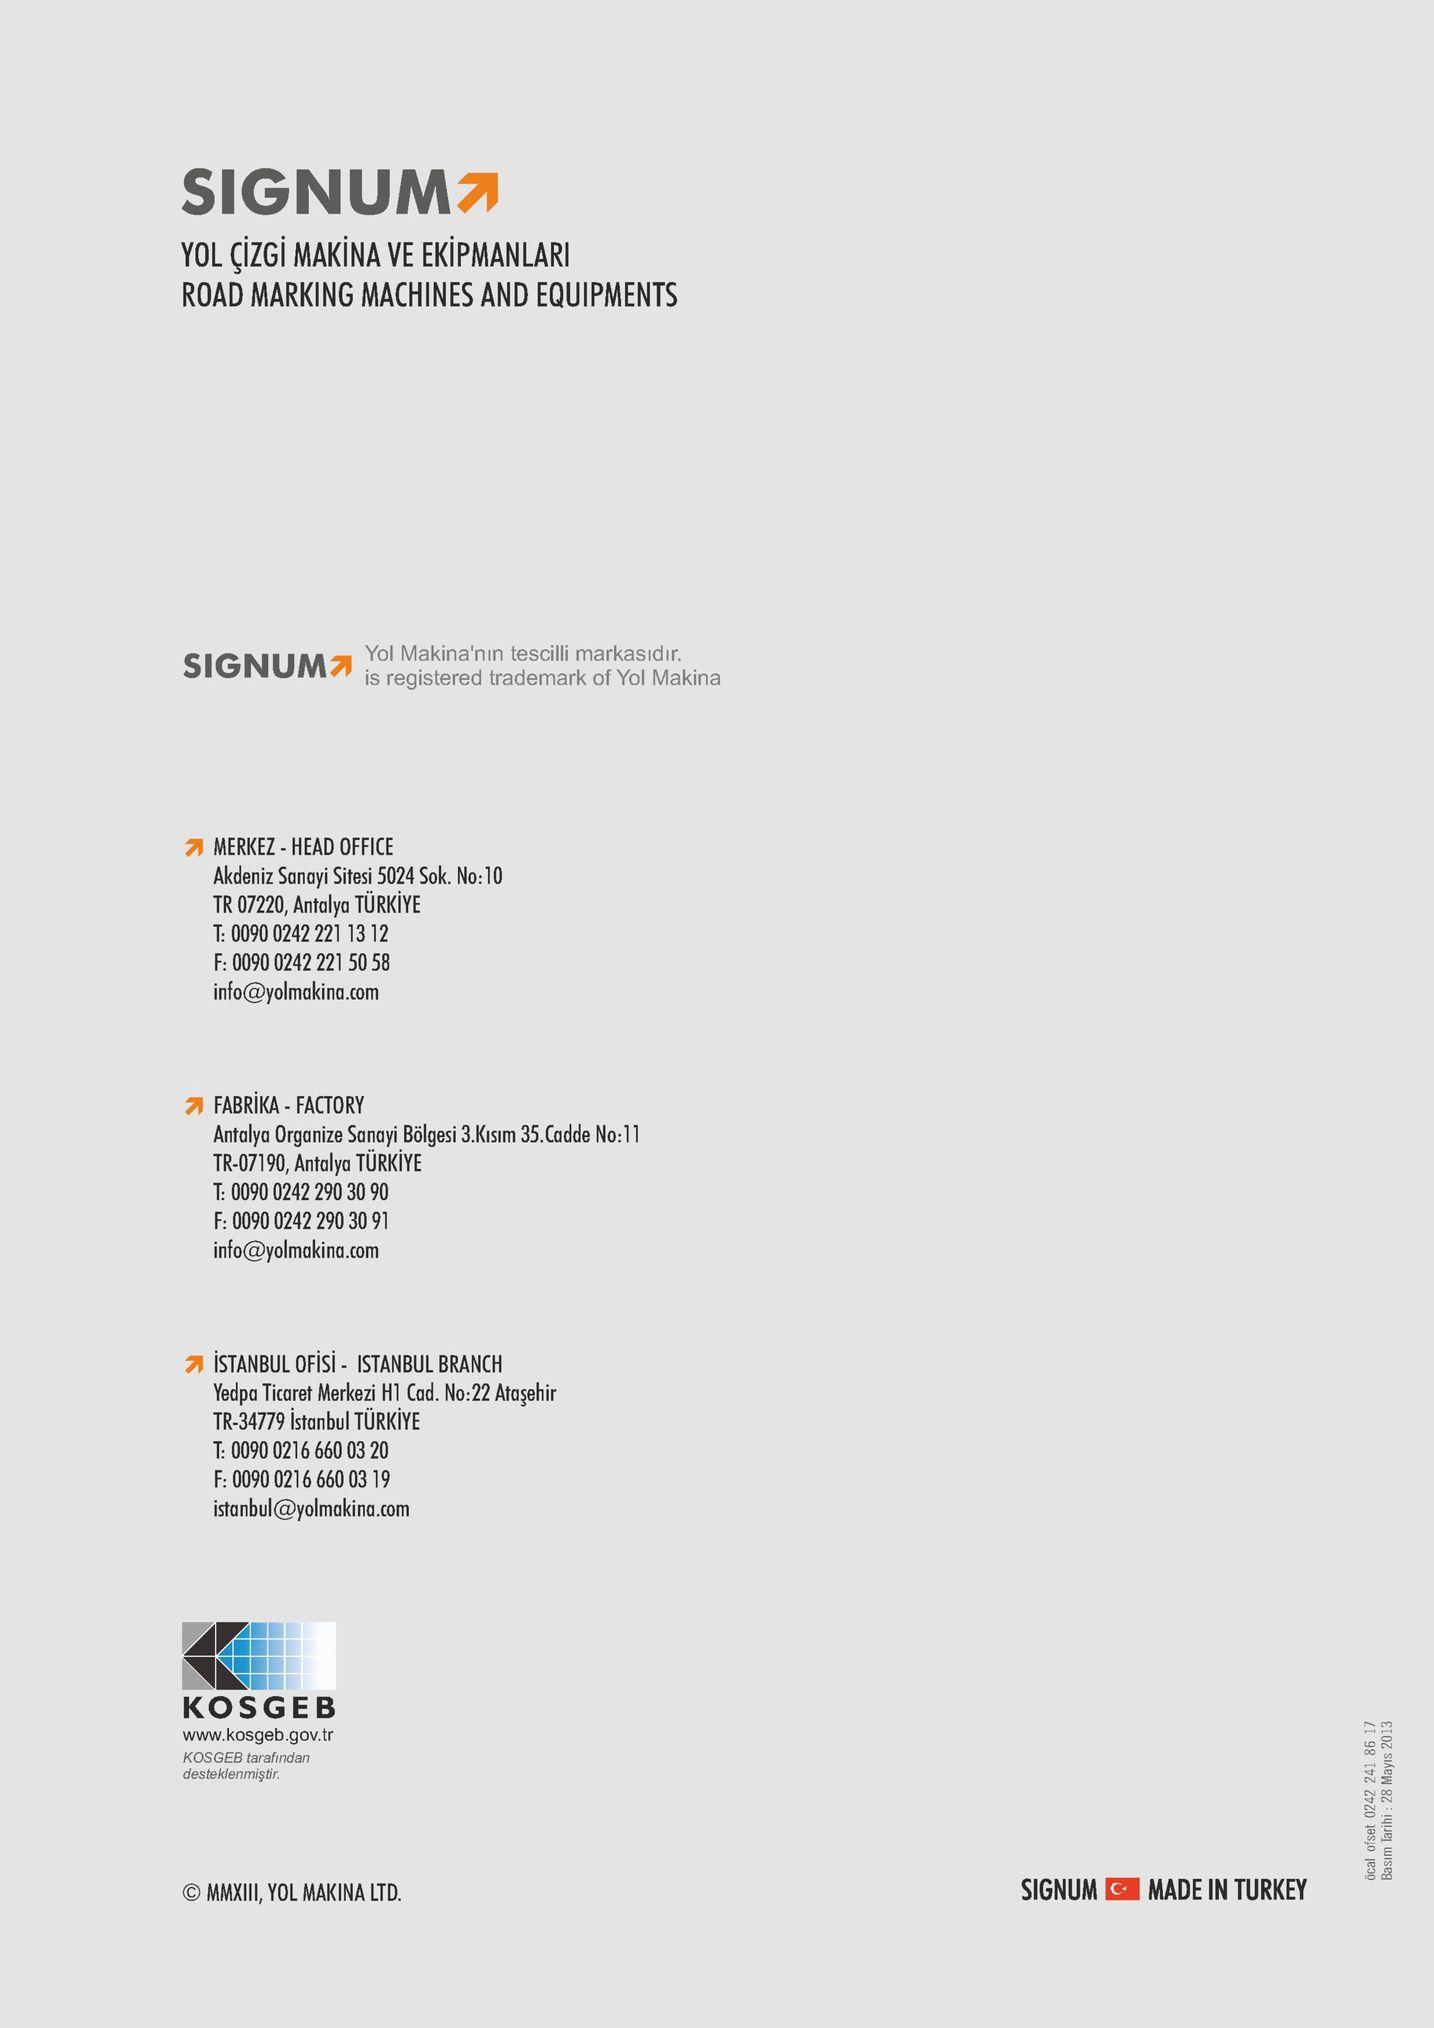 signum7 yol çizgi makina ve ekipmanlari road marking machines and equipments signum yol makina'nın tescilli markasidır is registered trademark of yol makina merkez - head office akdeniz sanayi sitesi 5024 sok. no:10 tr 07220, antalya türkiye t: 0090 0242 221 13 12 f: 0090 0242 221 50 58 info@yolmakina.com fabrika-factory antalya organize sanayi bölgesi 3.kisım 35.cadde no:11 tr-07190, antalya türkiye t: 0090 0242 290 30 90 f: 0090 0242 290 30 91 info@yolmakina.com istanbul ofisi- istanbul branch yedpa ticaret merkezi h1 cad. no:22 ataşehir tr-34779 istanbul türkiye t: 0090 0216 660 03 20 f: 0090 0216 660 03 19 istanbul@yolmakina.com kosgeb www.kosgeb.gov.tr kosgeb tarafindan desteklenmiştir c mmxiii, yol makina ltd signum c made in turkey